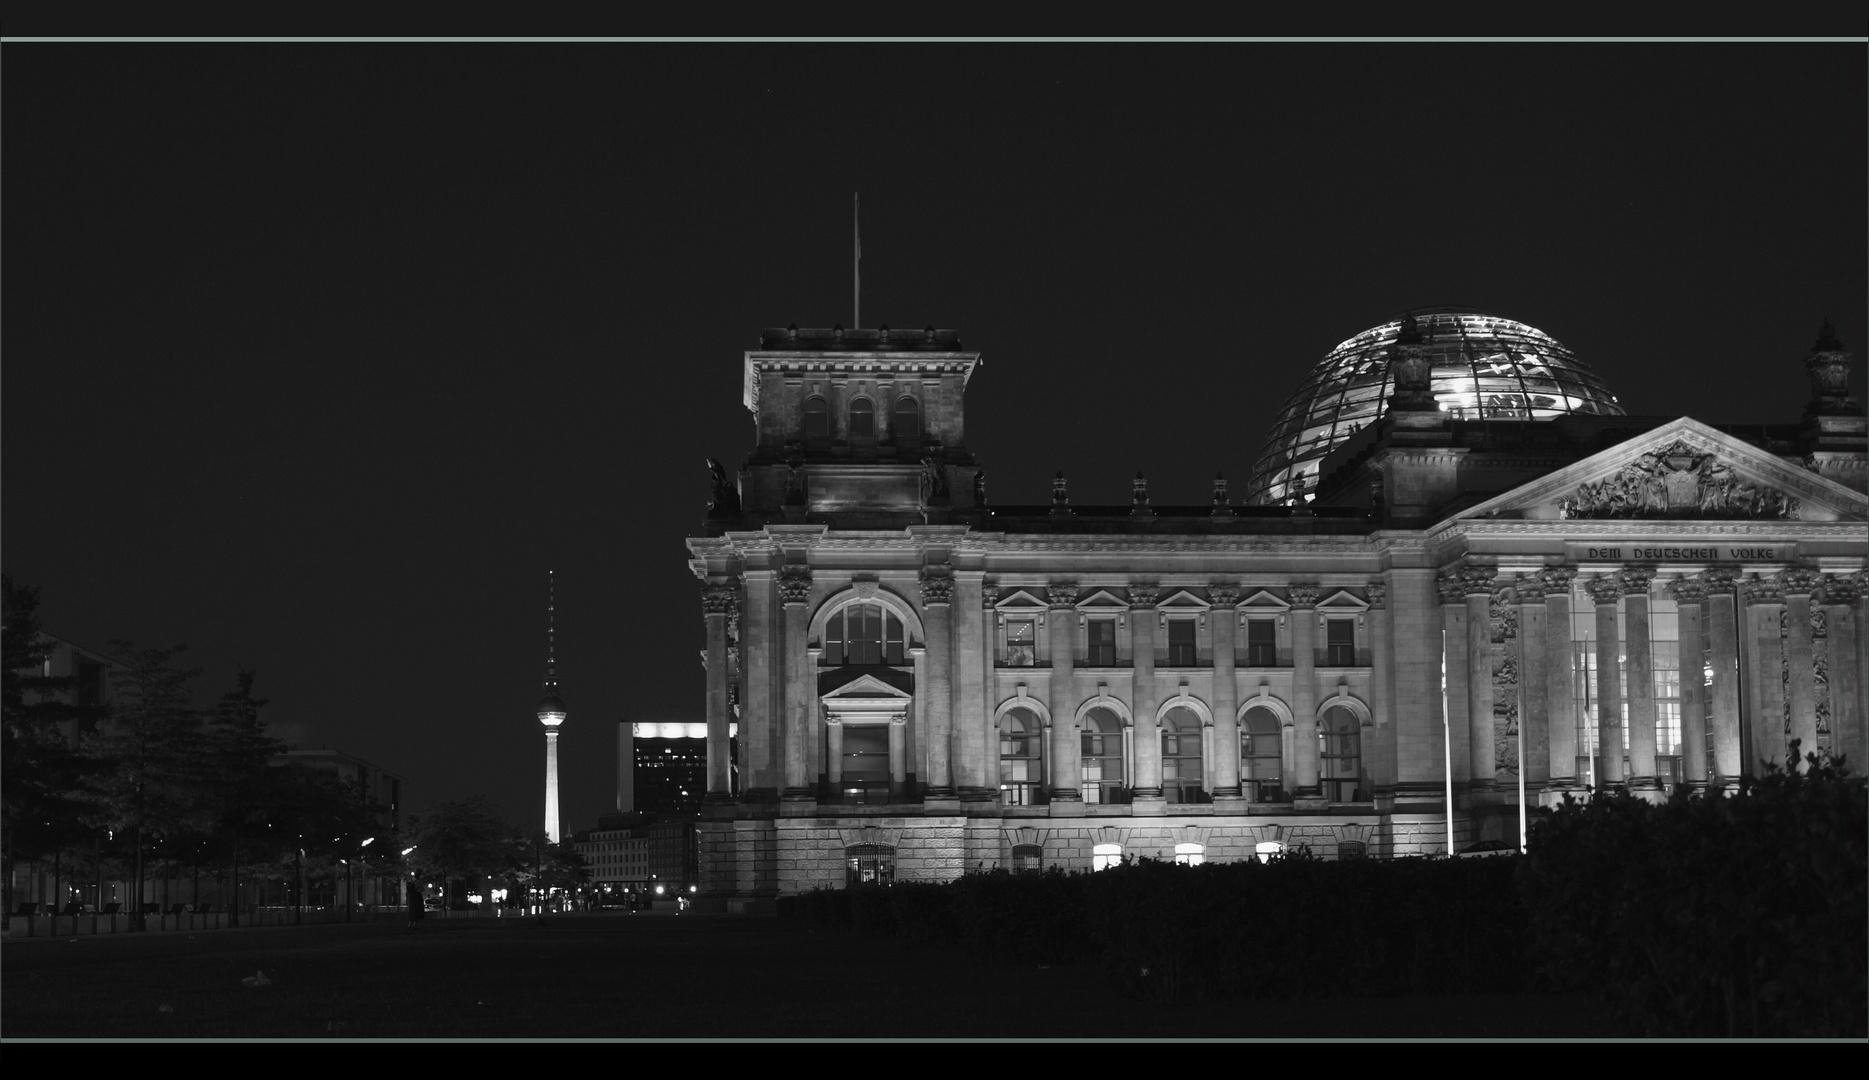 *Berlin Mitte @ night*